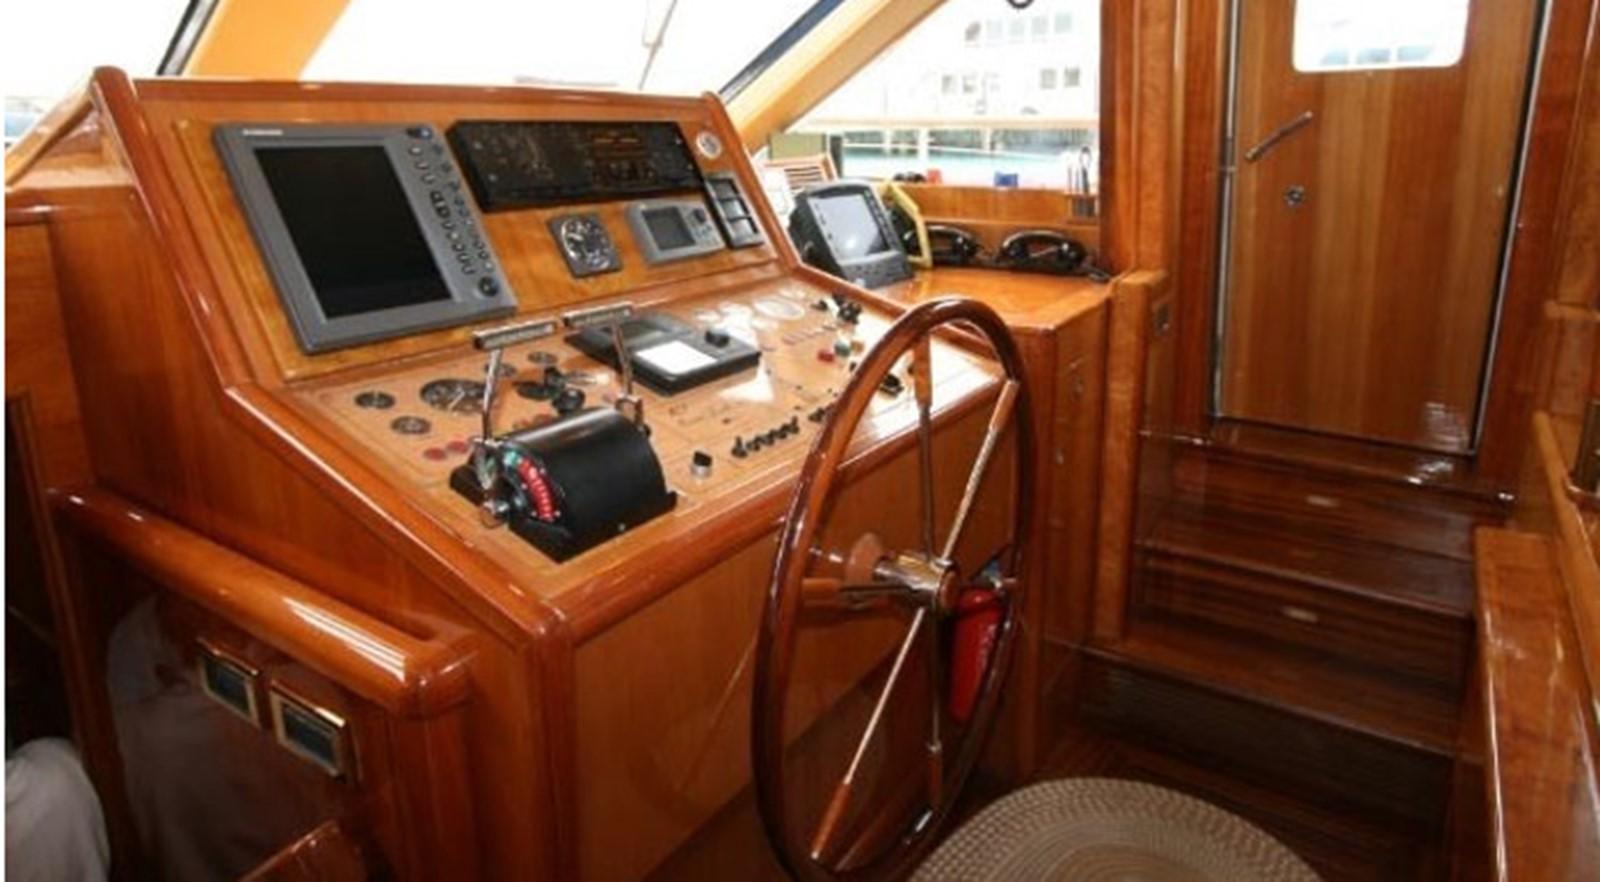 1999 CIHAN MARINE LTD. Ocean Going Ketch Motor S/Y Motorsailor 2271542